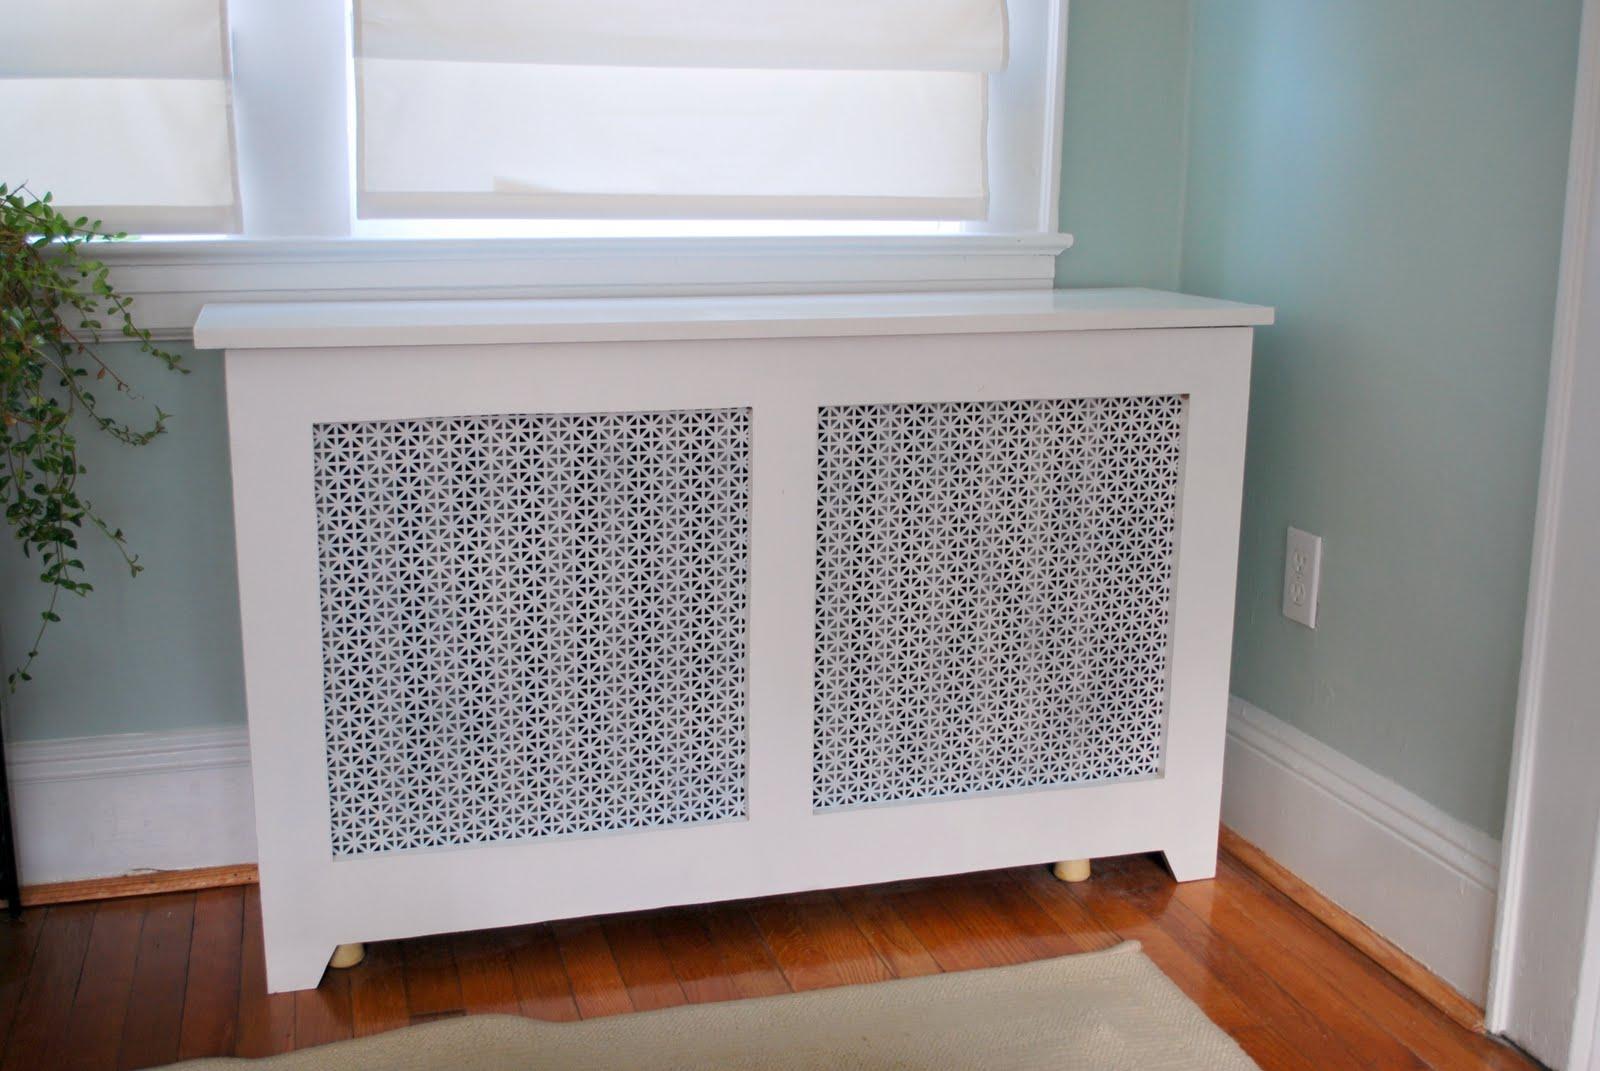 Kitchen window box ideas - Radiator Covers Ikea Hack Kitchen Garage Doors Together With